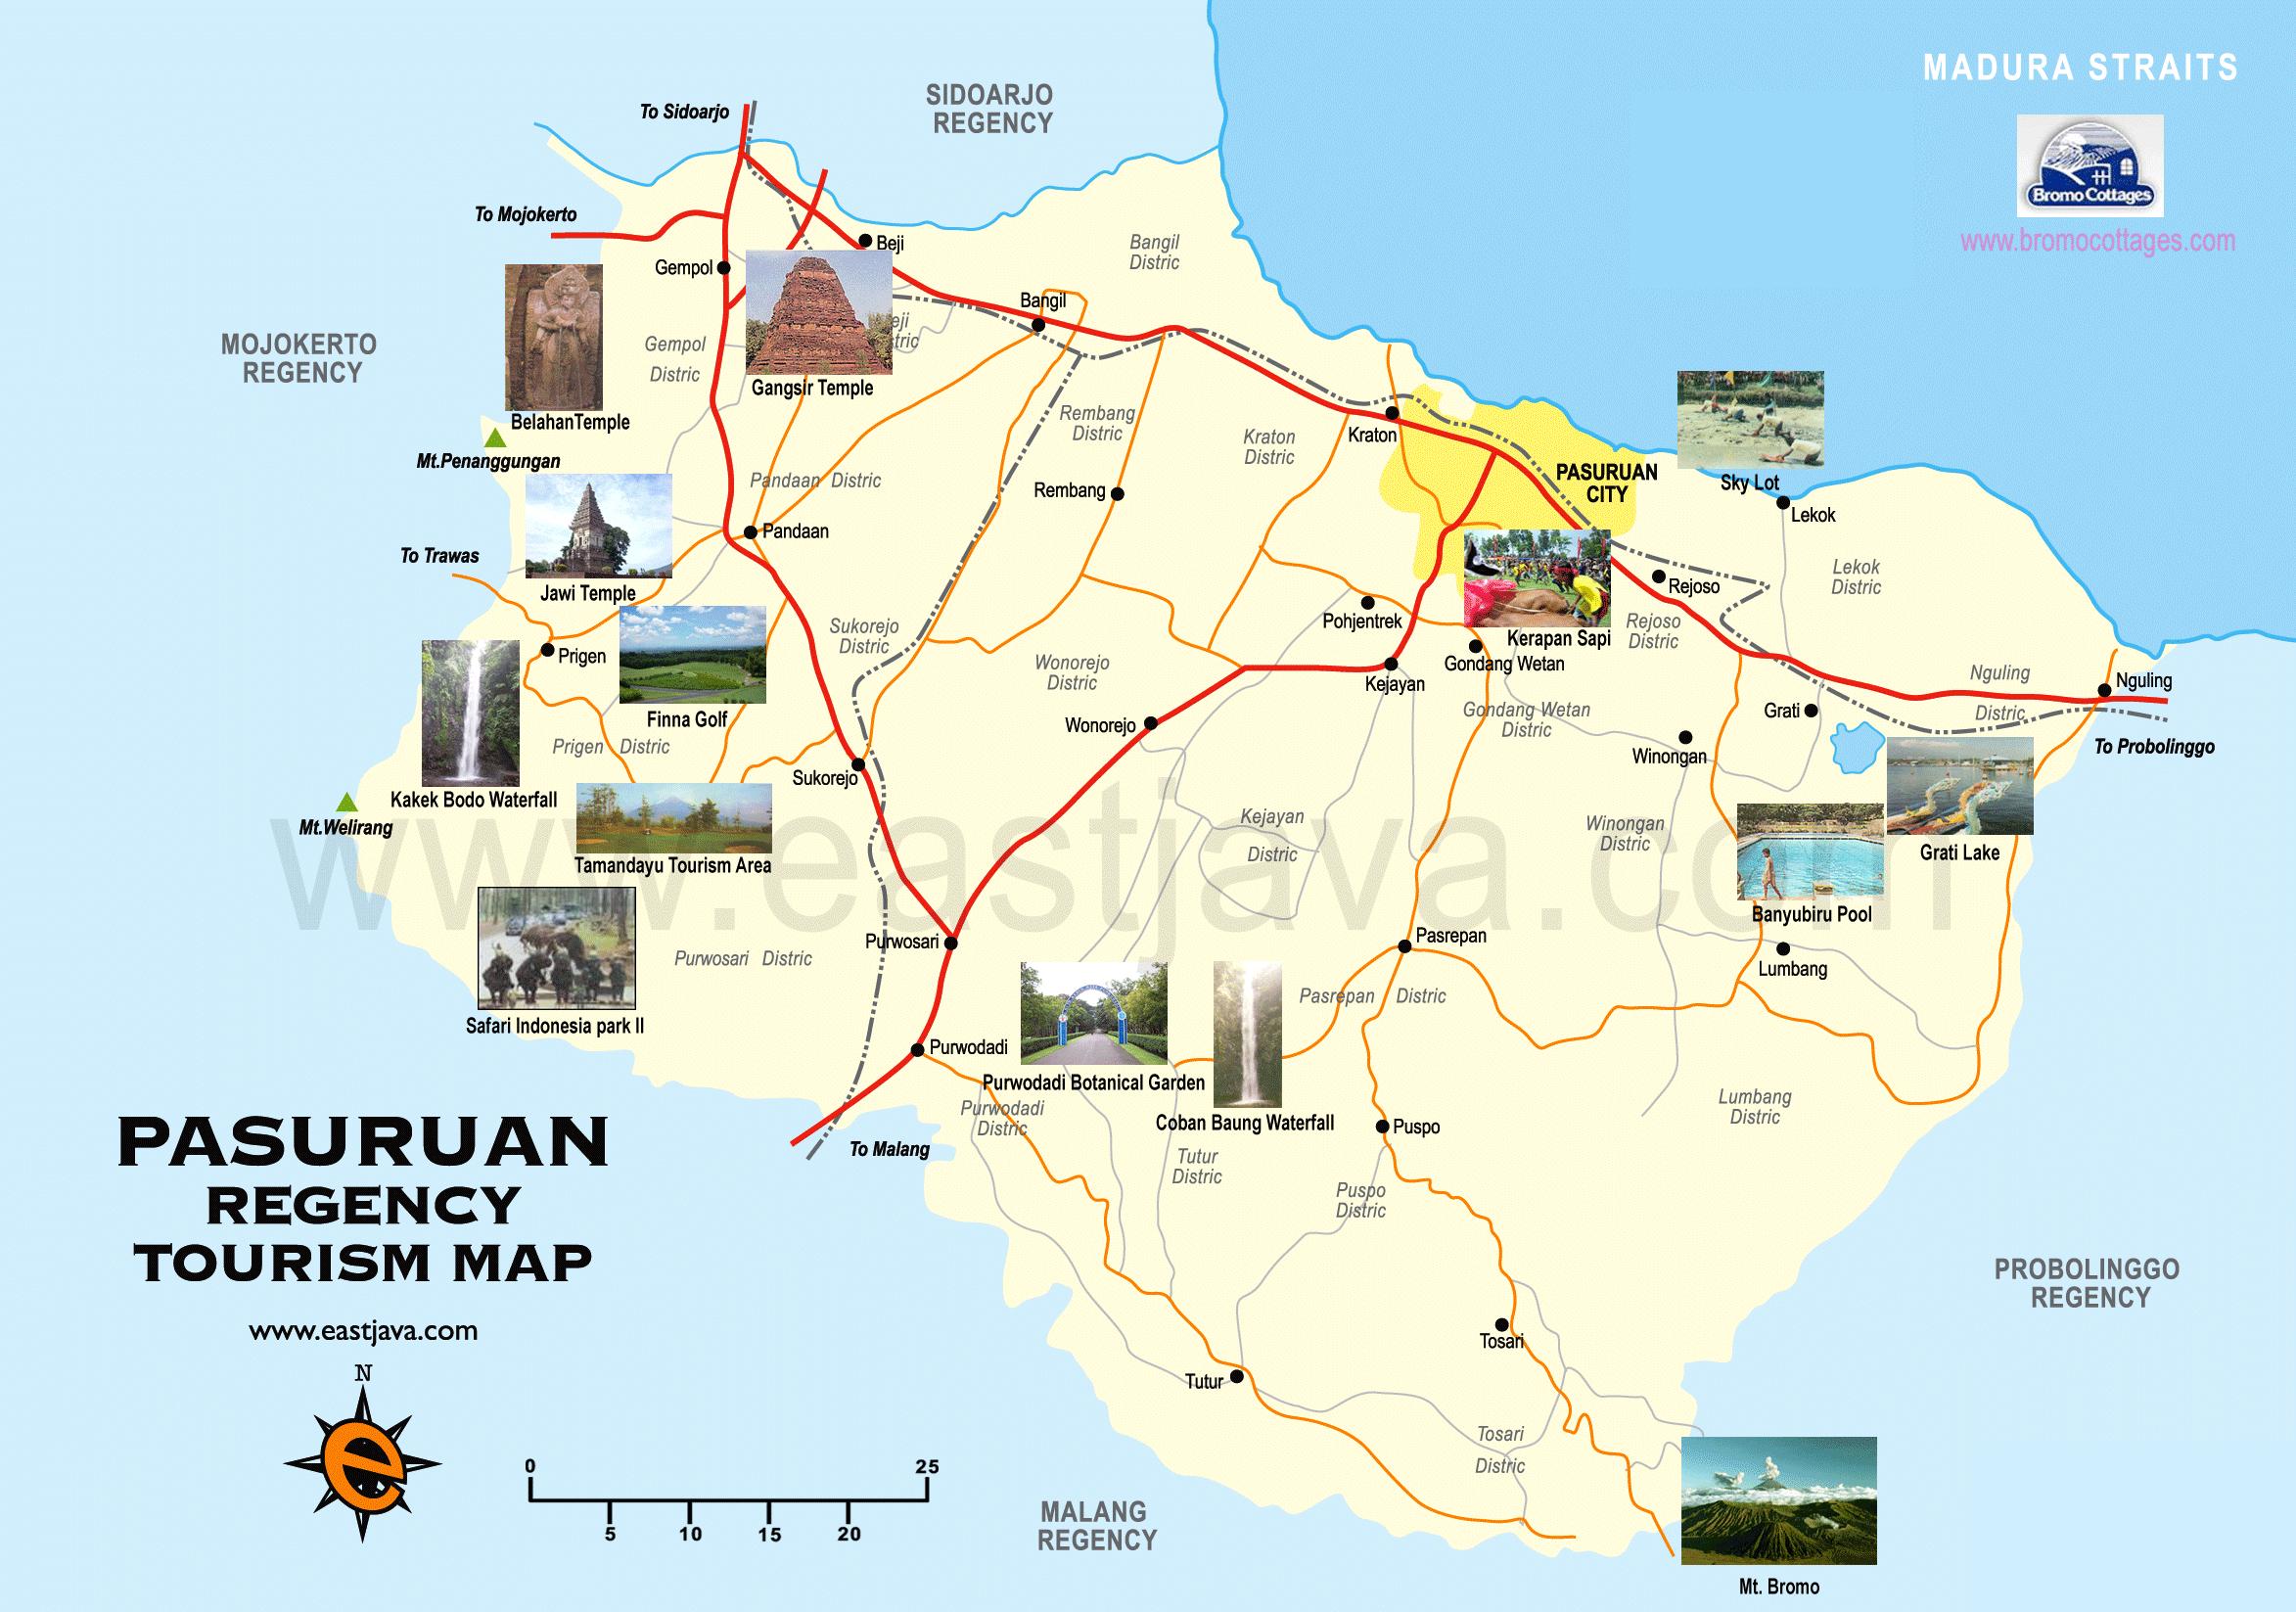 Peta Kabupaten Kota Pasuruan Meliputi Wisata Bukit Flora Kab